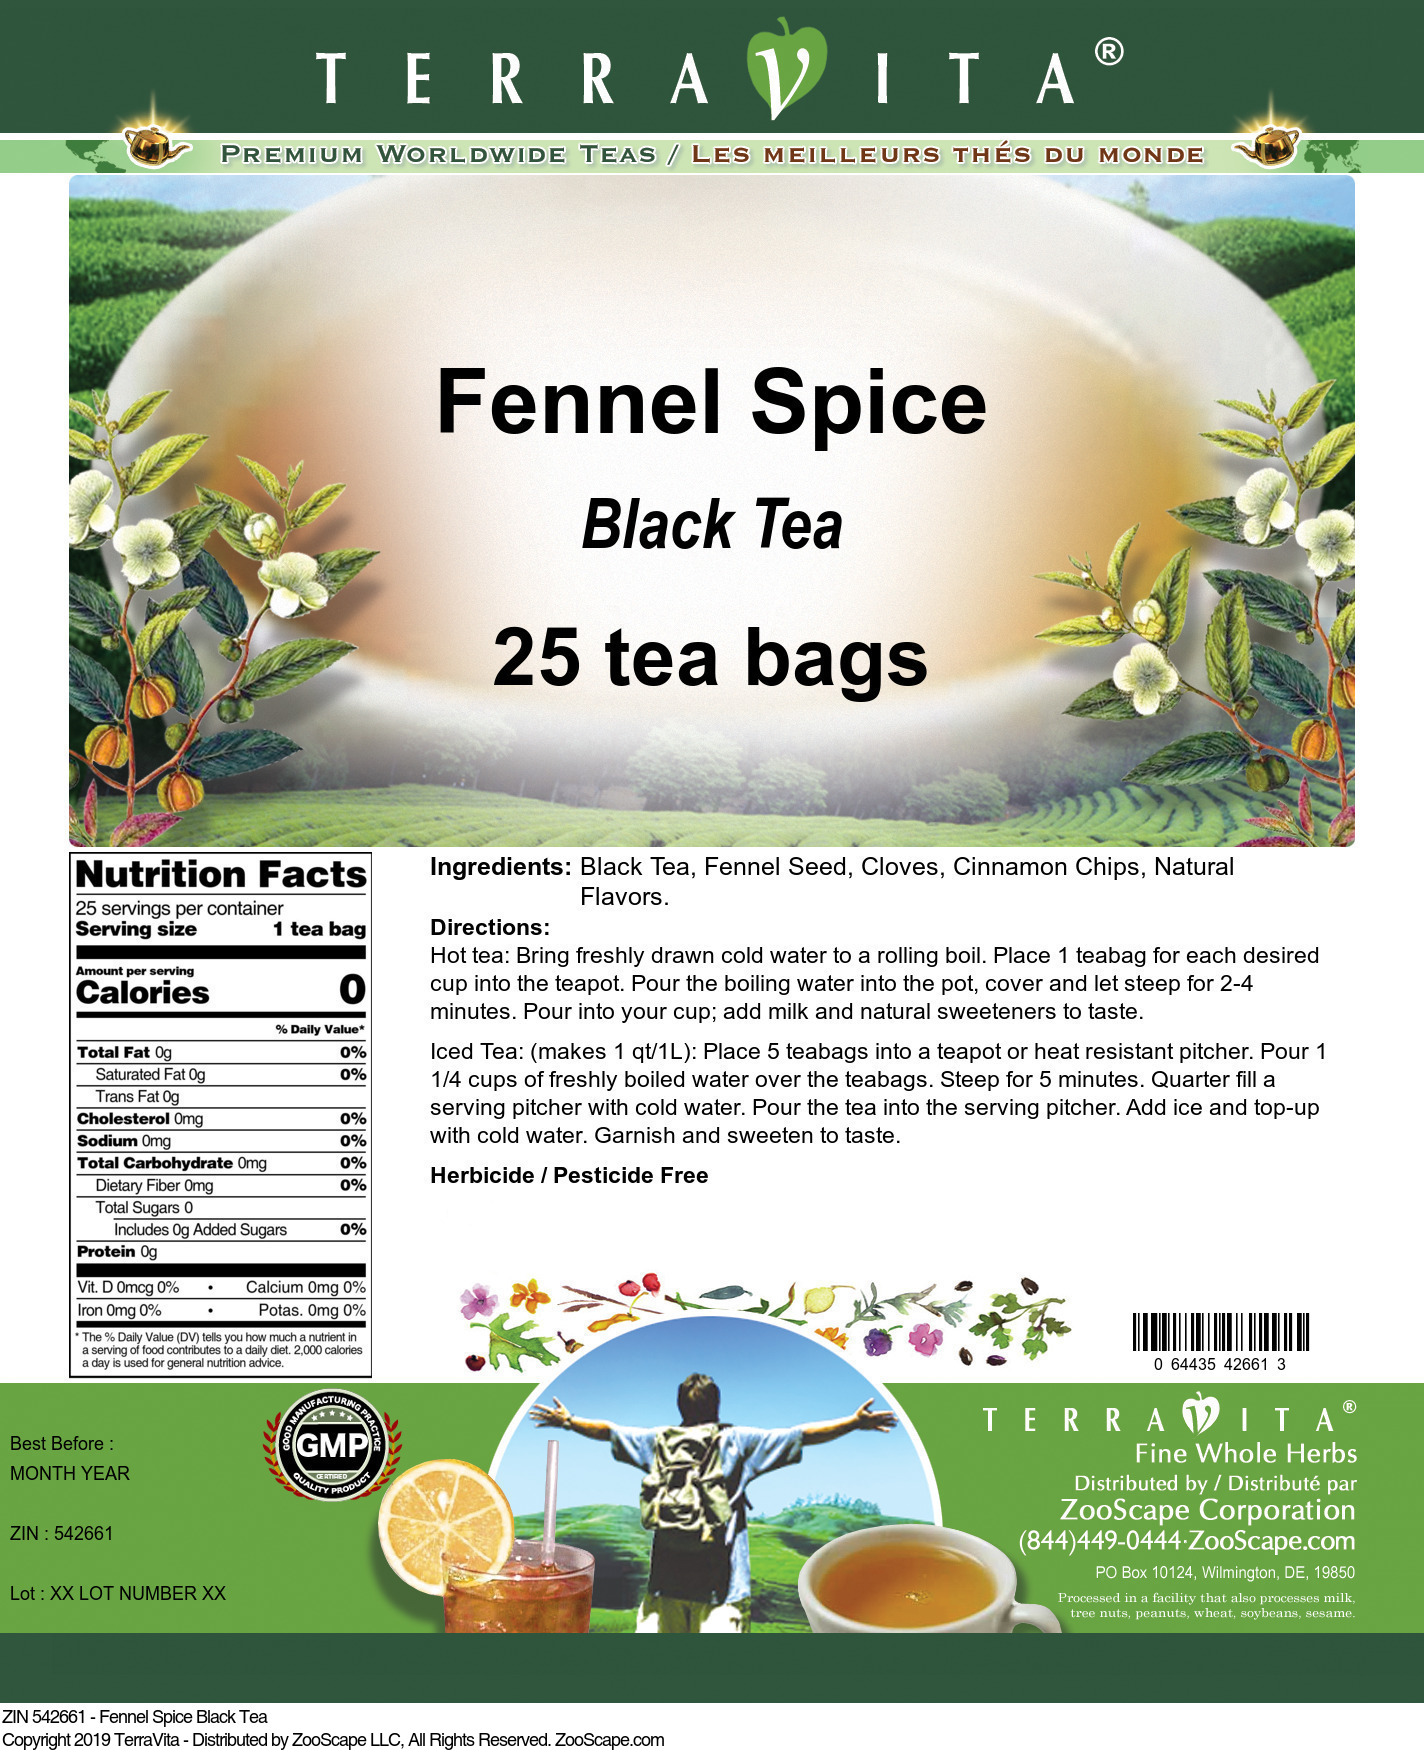 Fennel Spice Black Tea